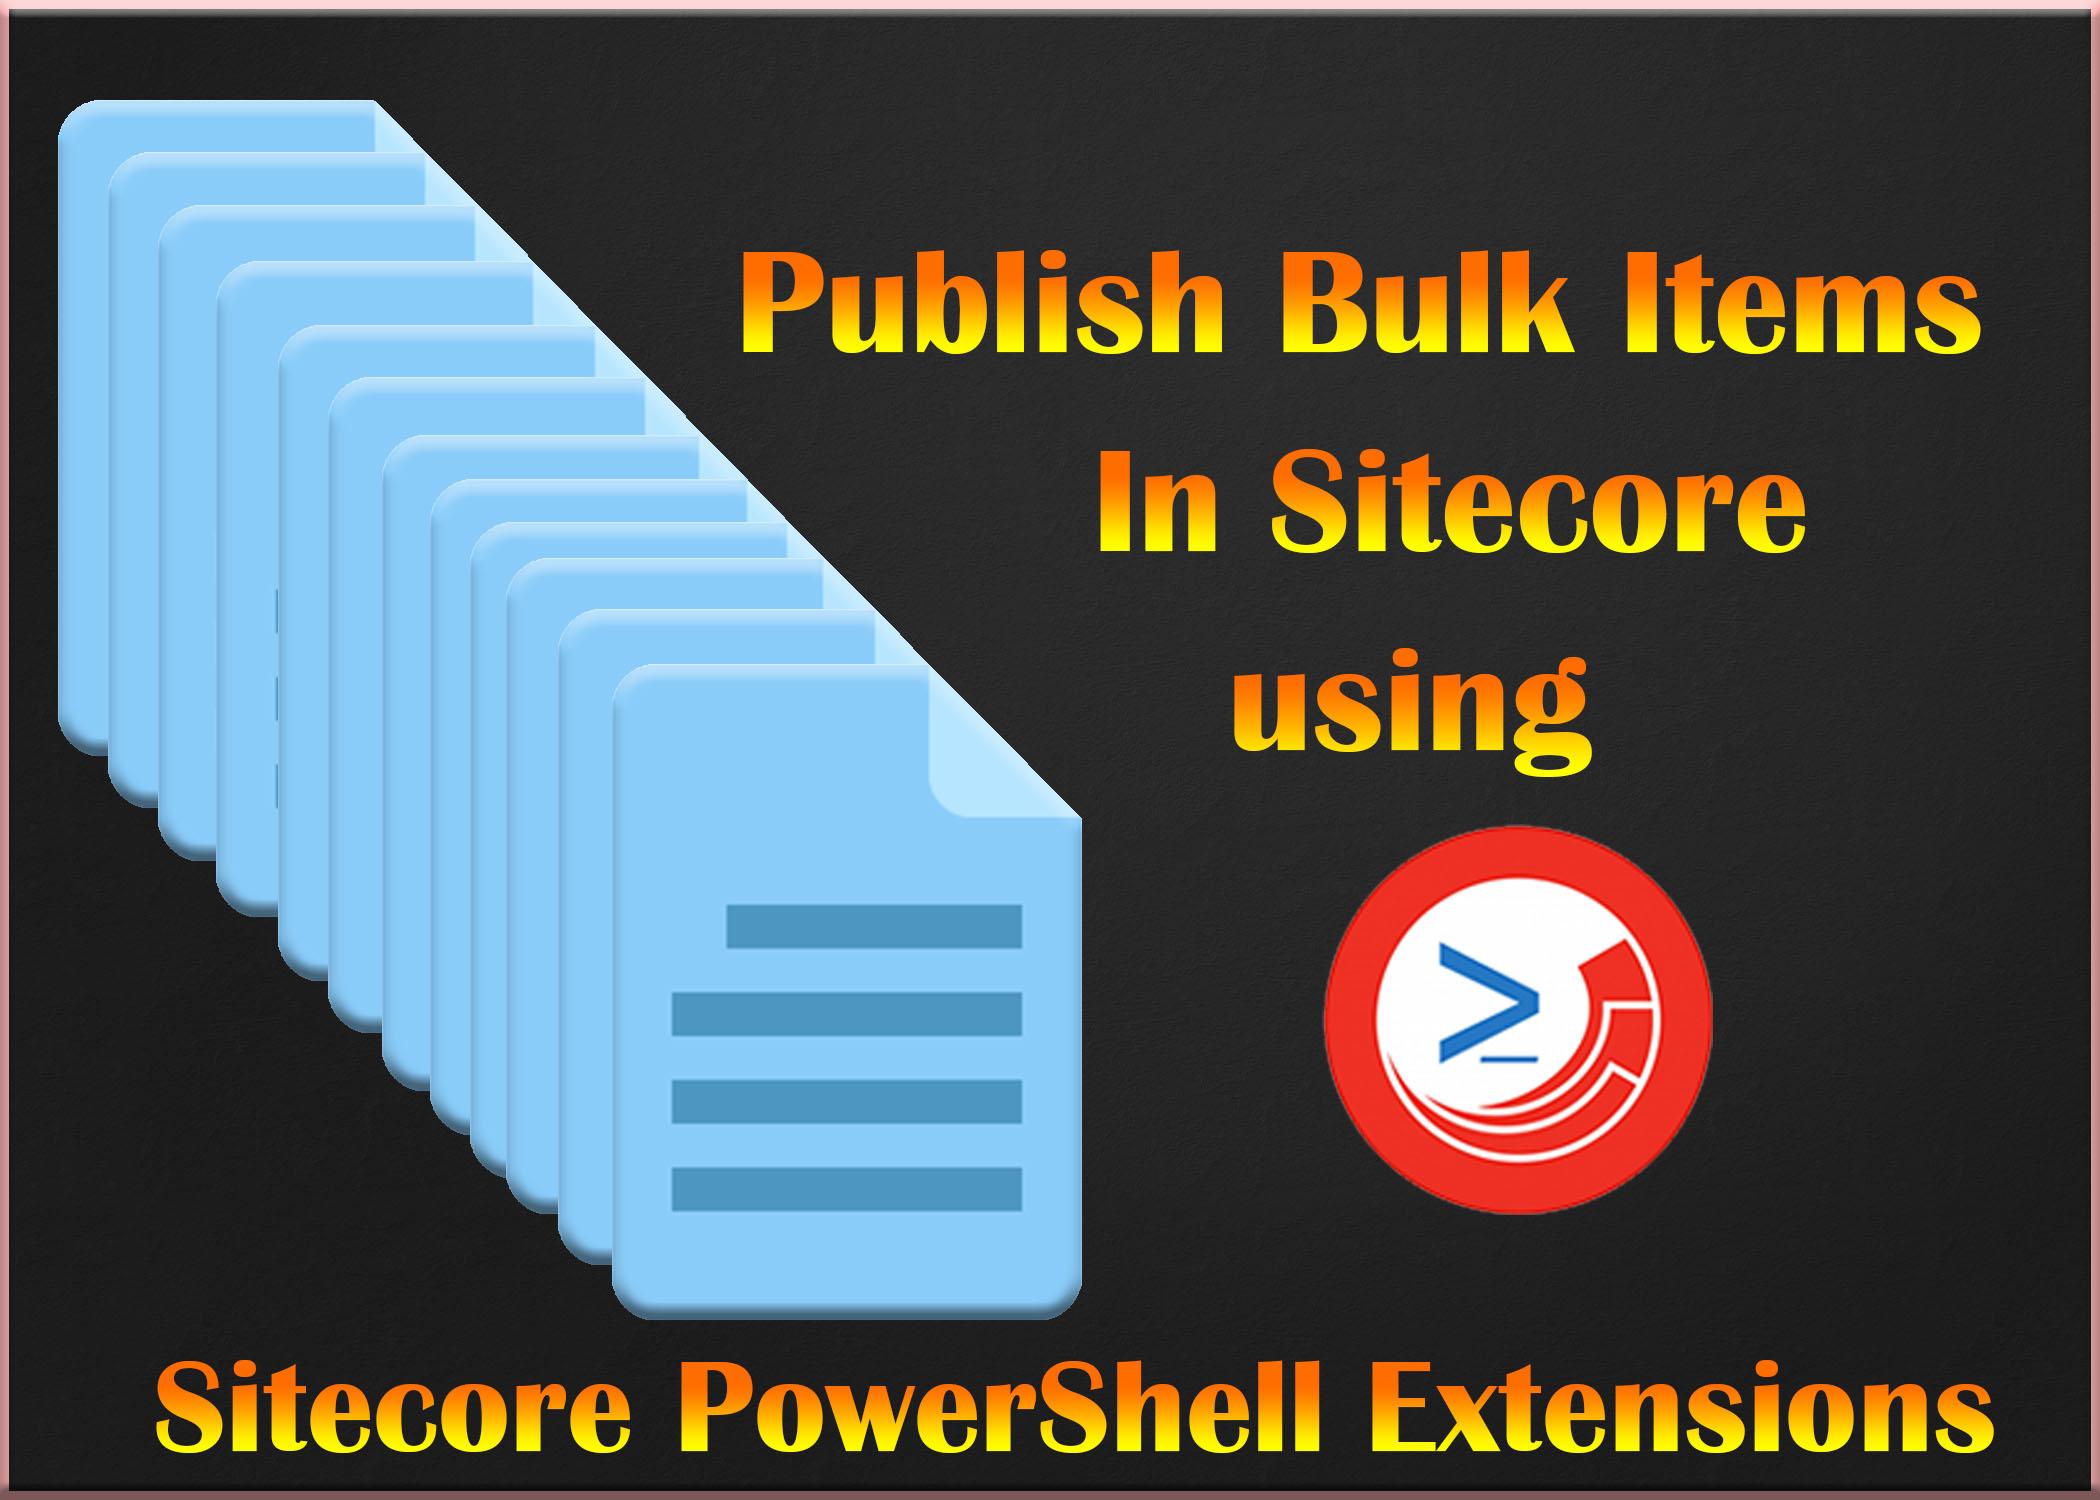 Publish Bulk Items In Sitecore